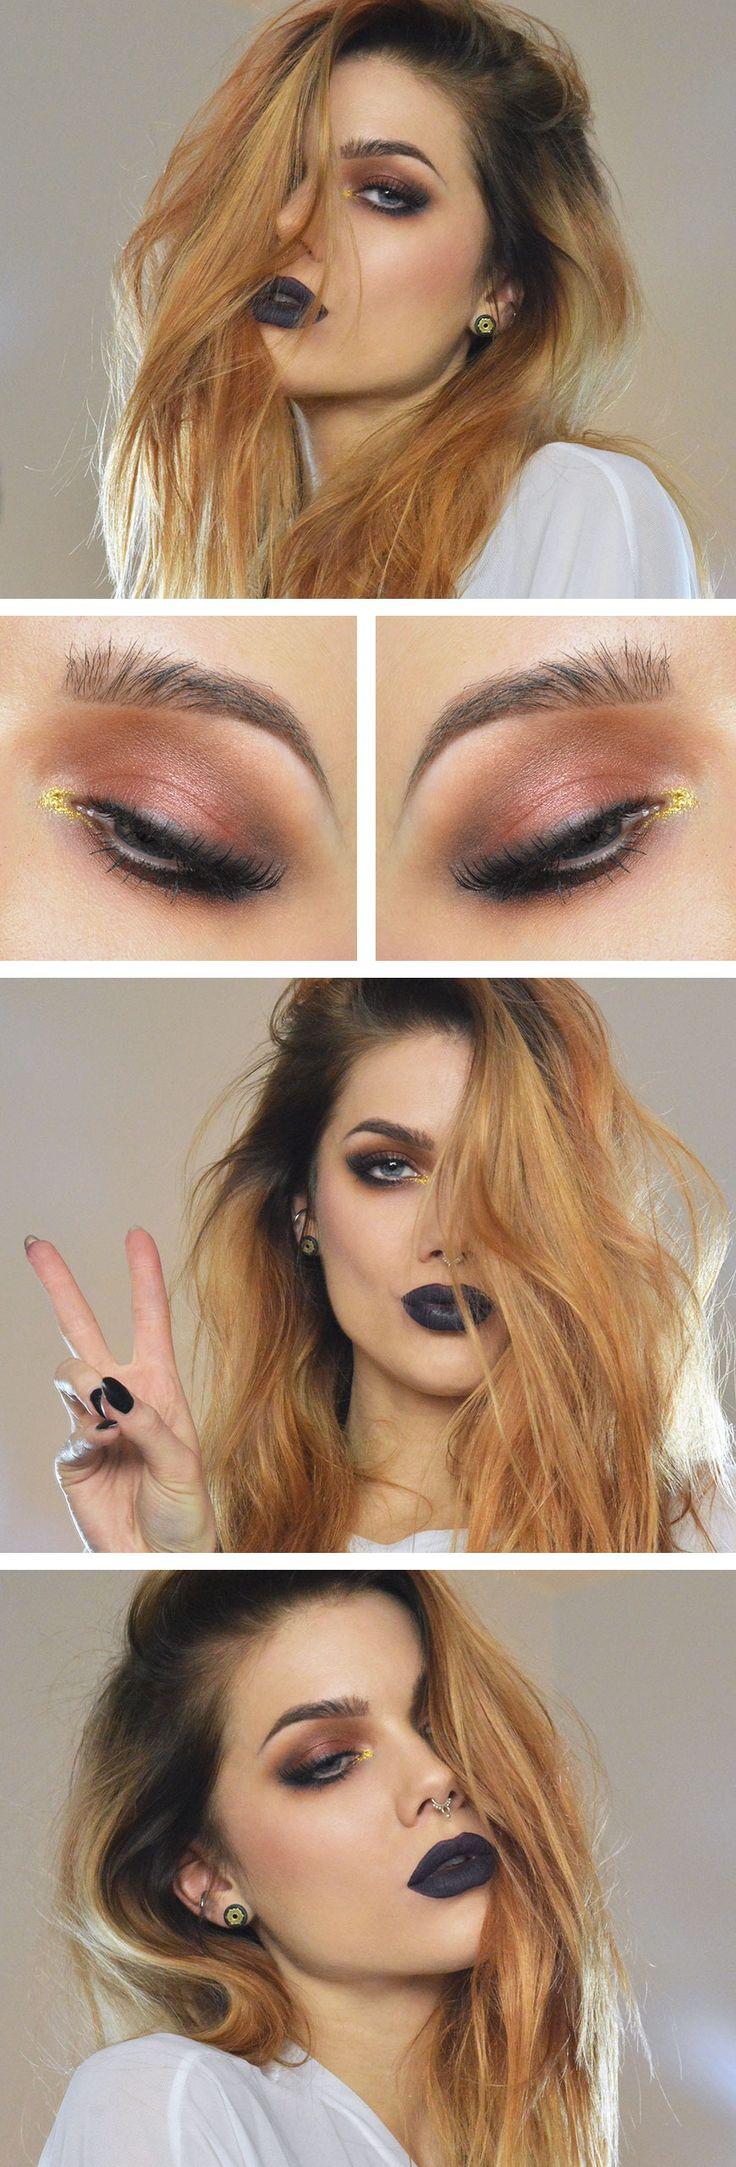 best makeup bar images on pinterest make up looks hair dos